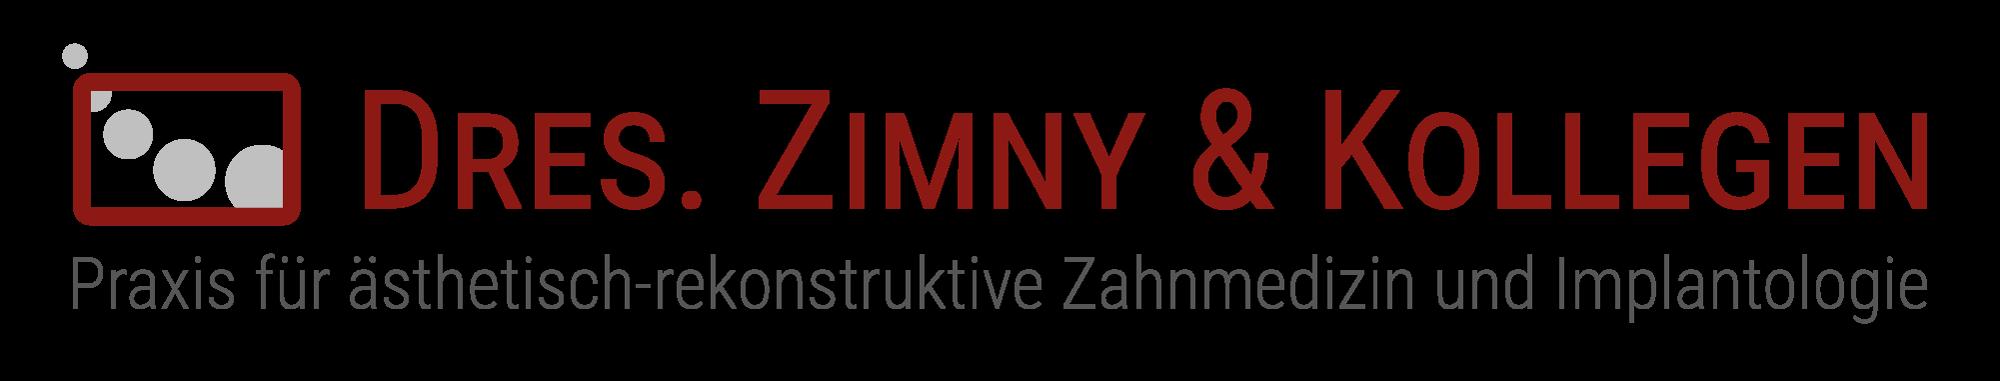 Logo Zahnarztpraxis Dres. Zimny und Kollegen Berlin